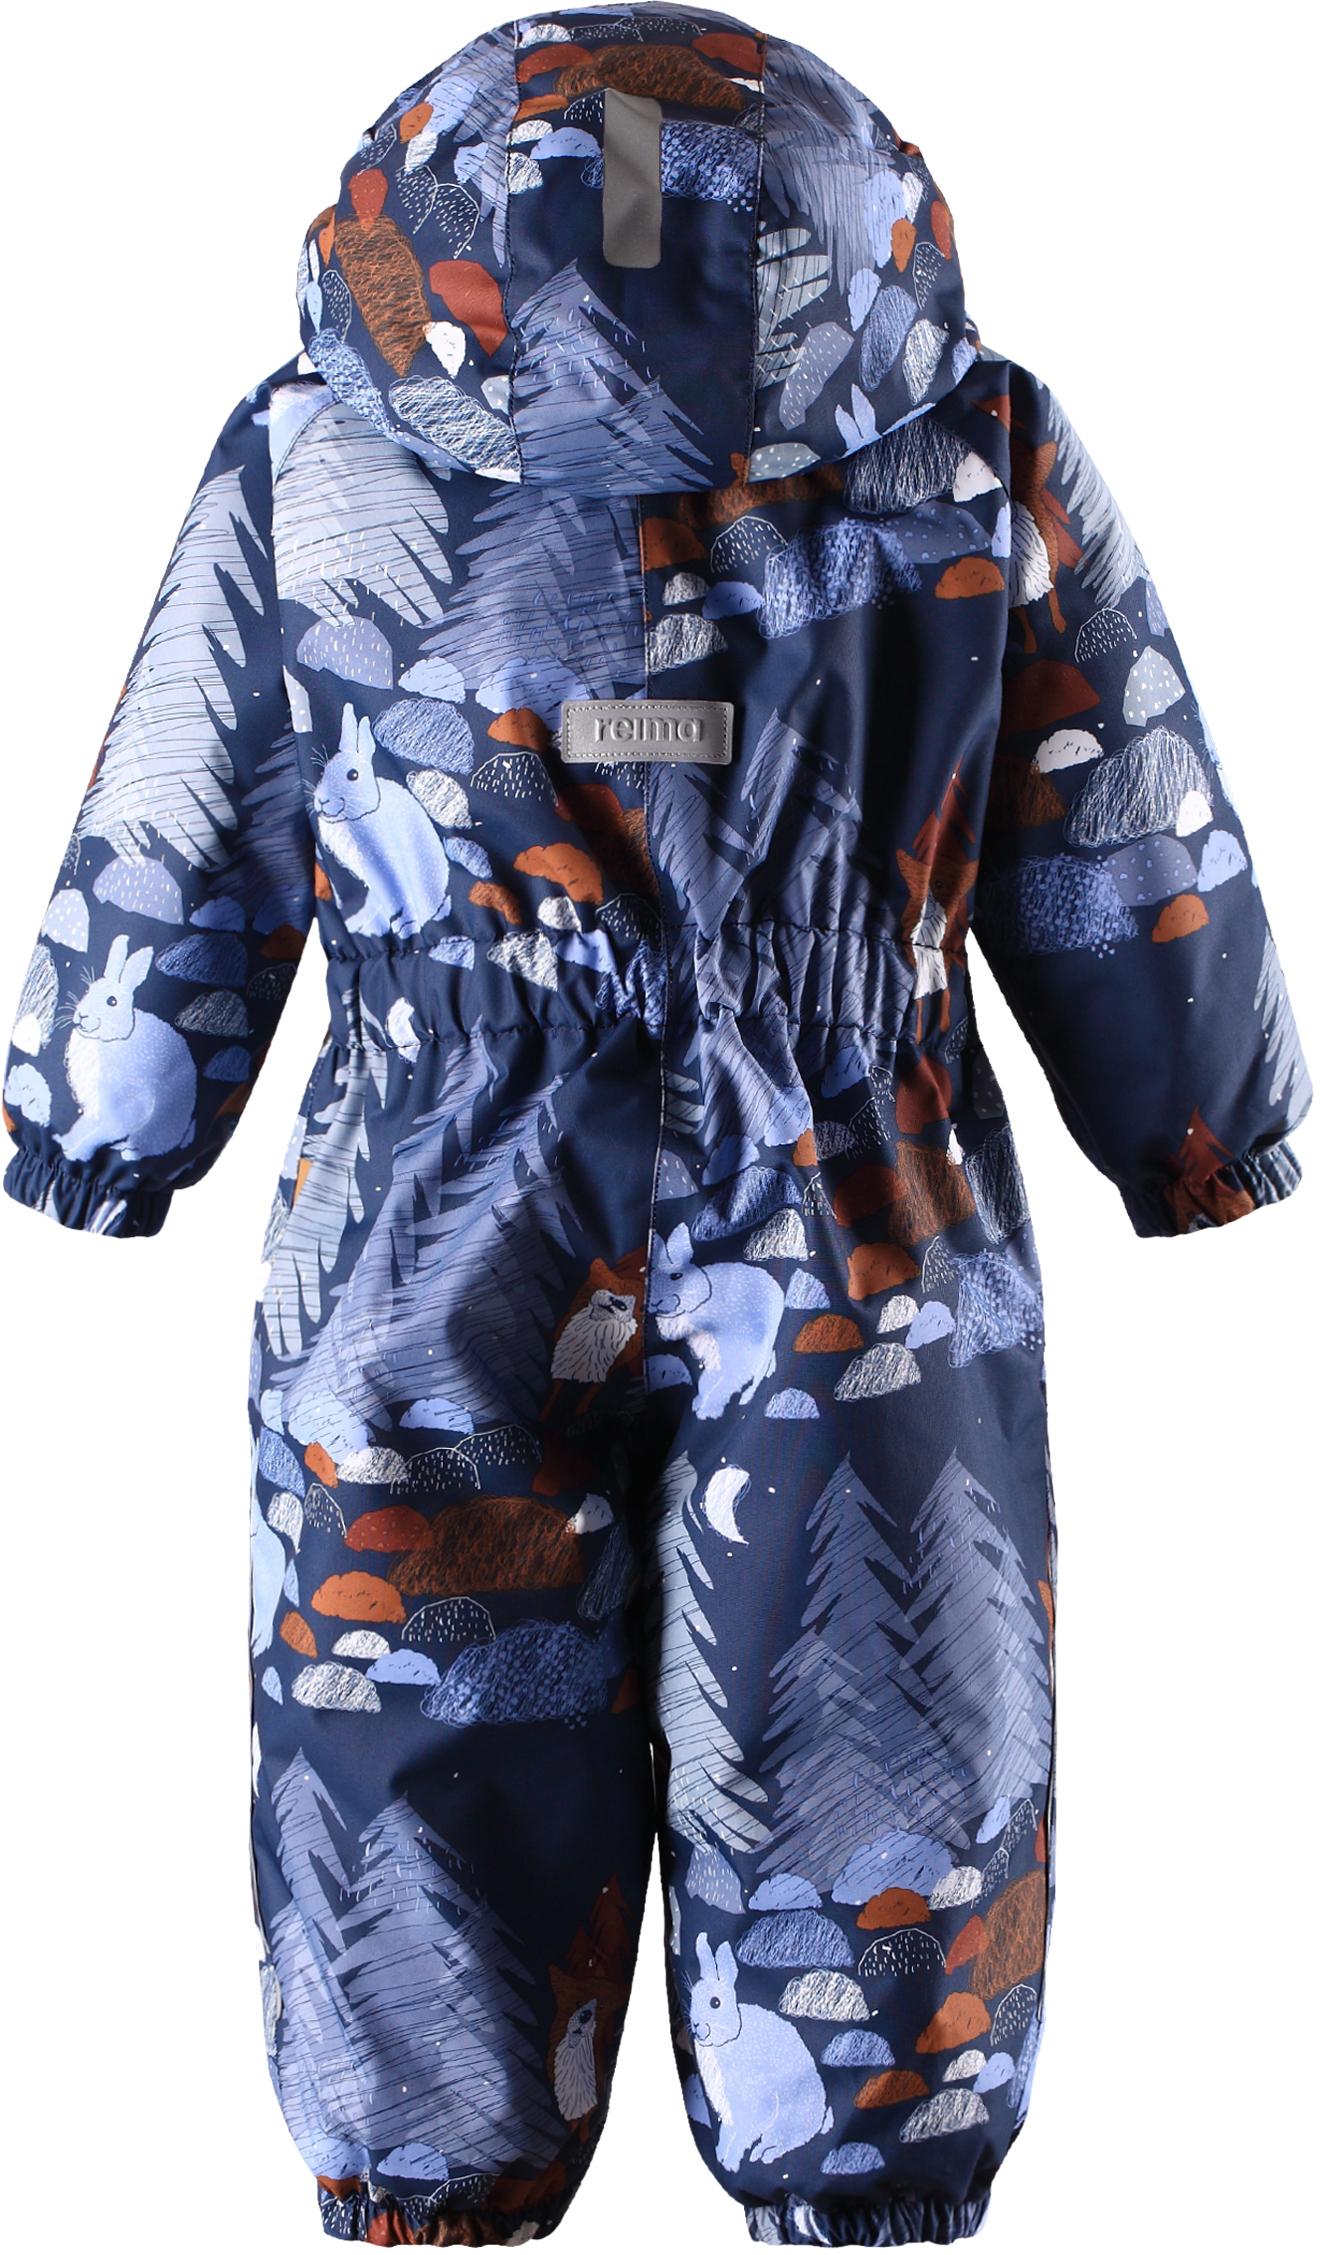 Reima winter overalls: customer reviews 8